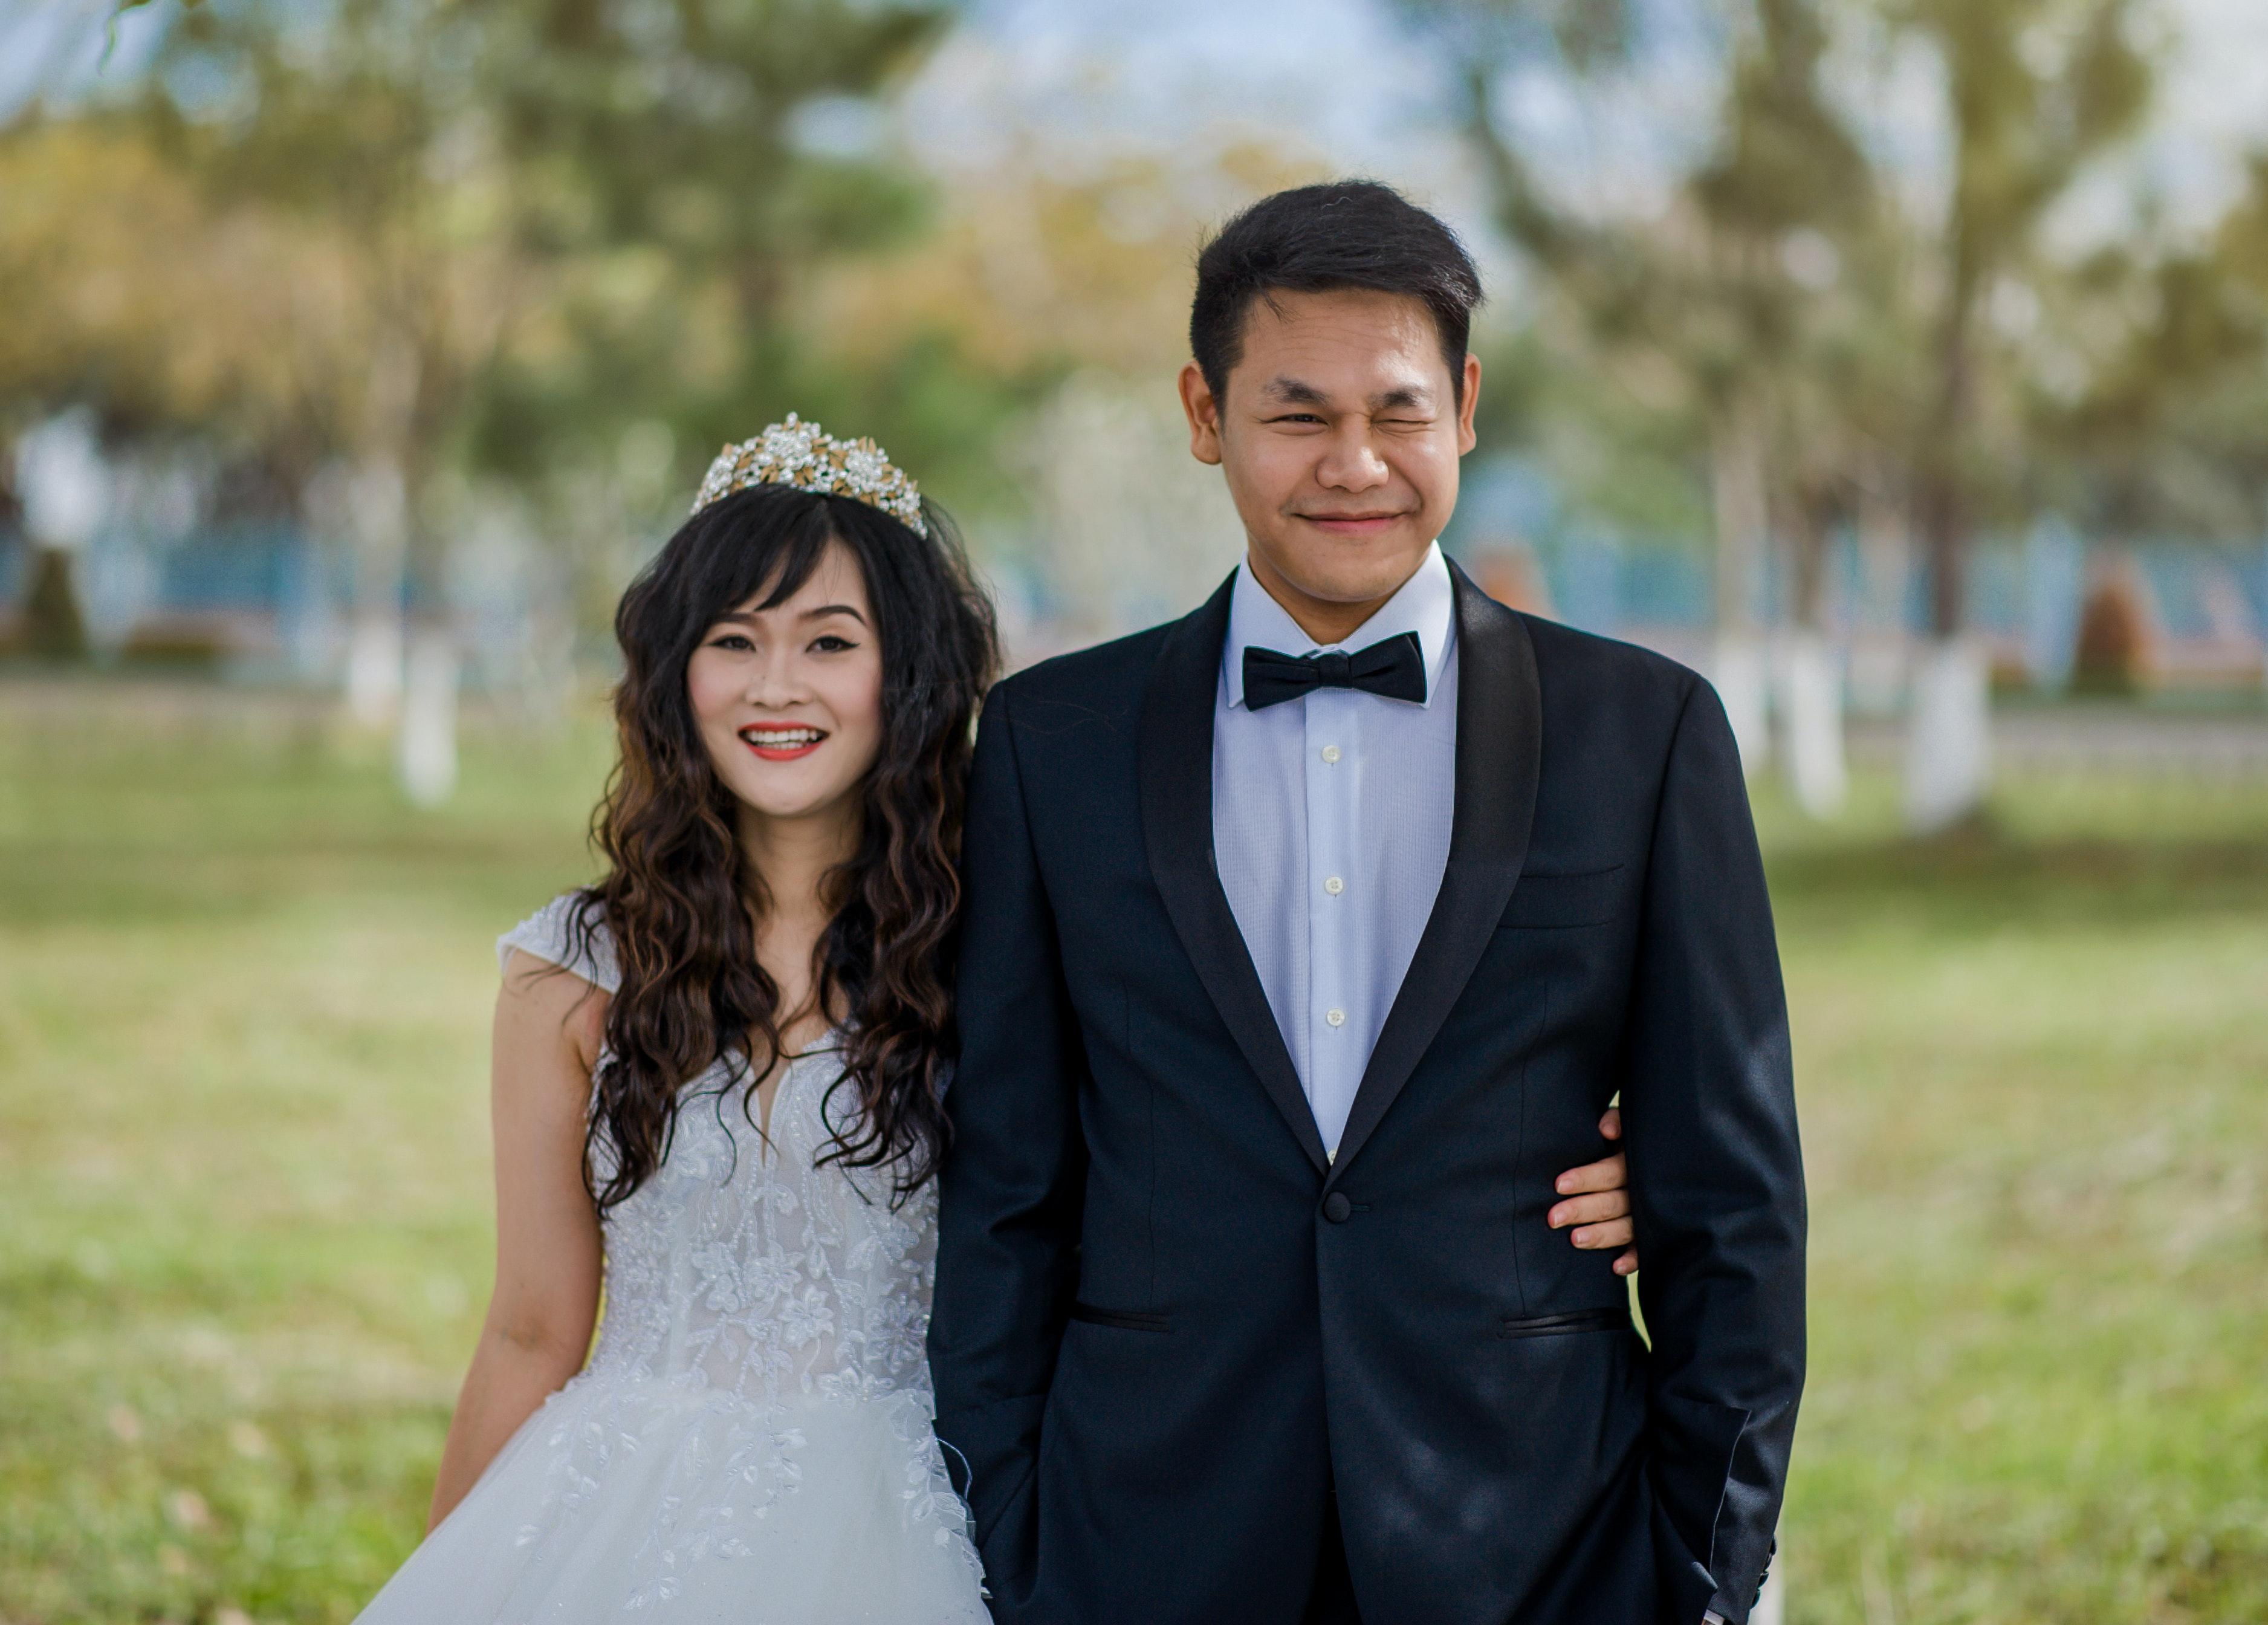 Men Wearing Black Suit Jacket and Woman Wearing White Wedding Gown ...